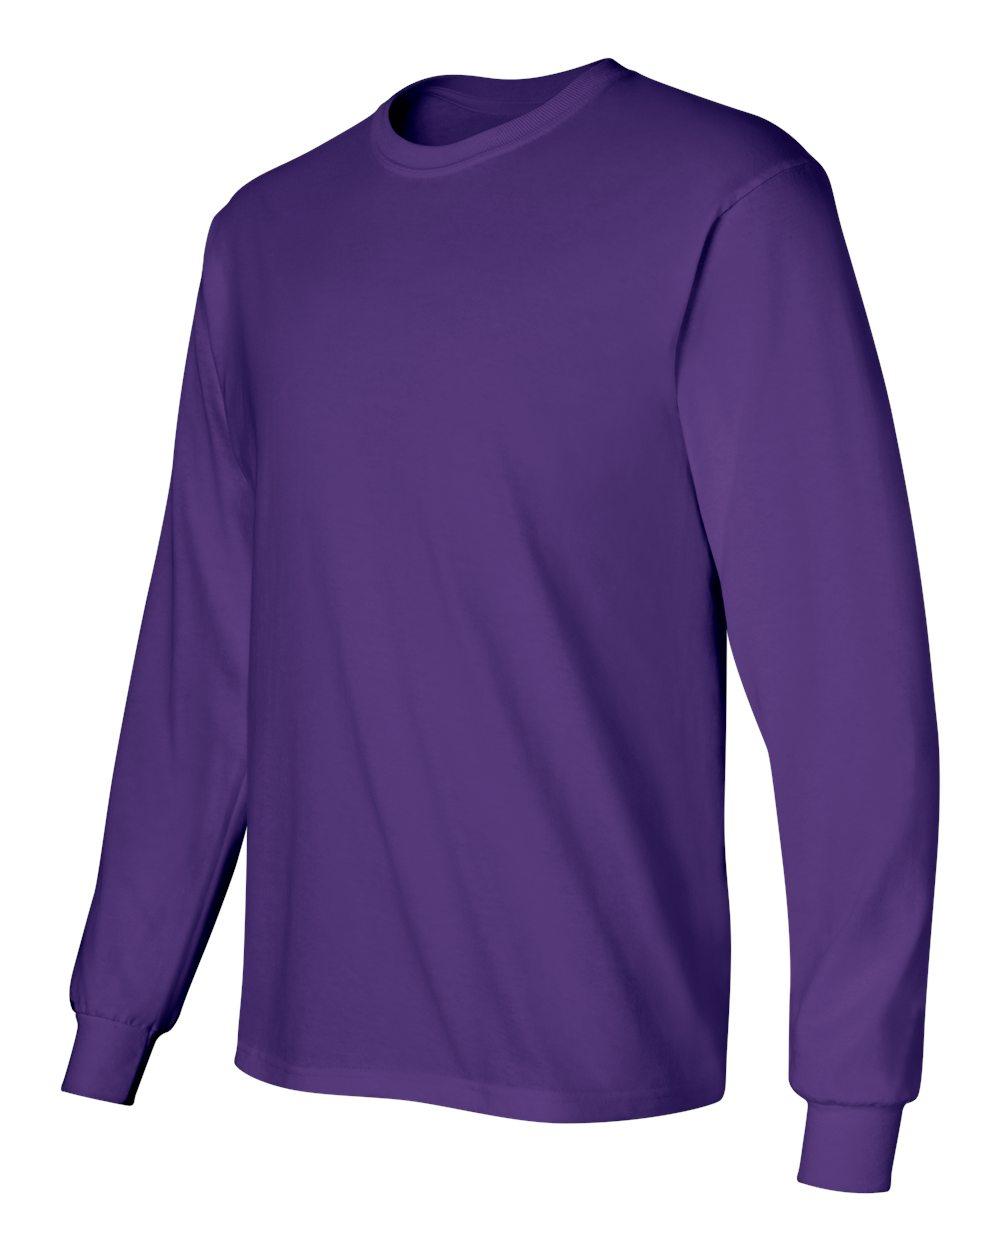 Gildan-Men-039-s-Ultra-Cotton-6-oz-Long-Sleeve-T-Shirt-G240-S-5XL thumbnail 75